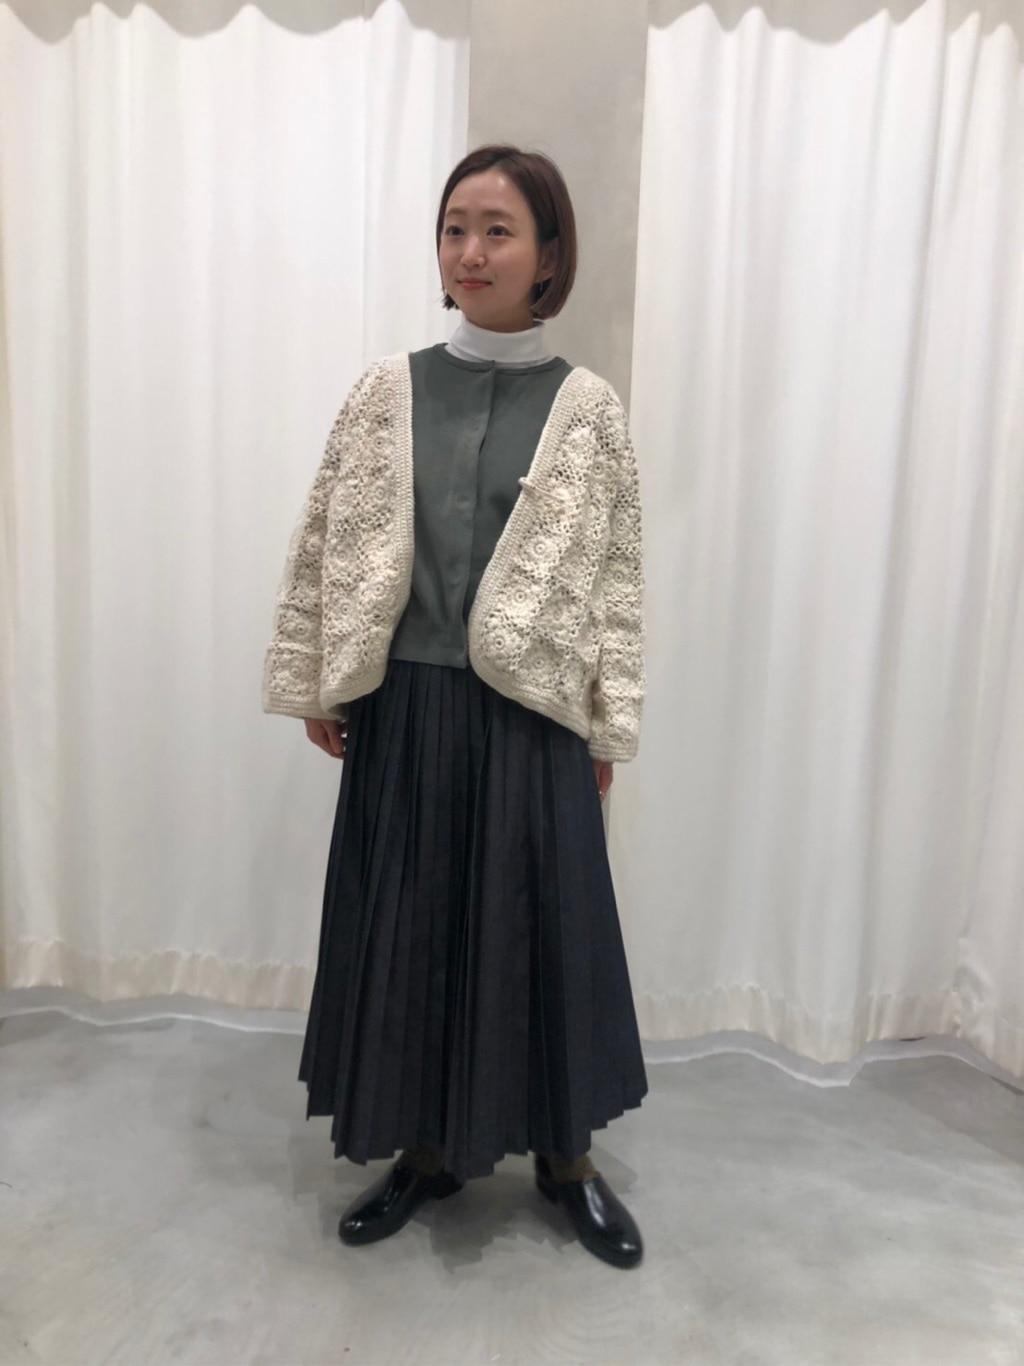 CHILD WOMAN , PAR ICI 東京スカイツリータウン・ソラマチ 2020.11.25